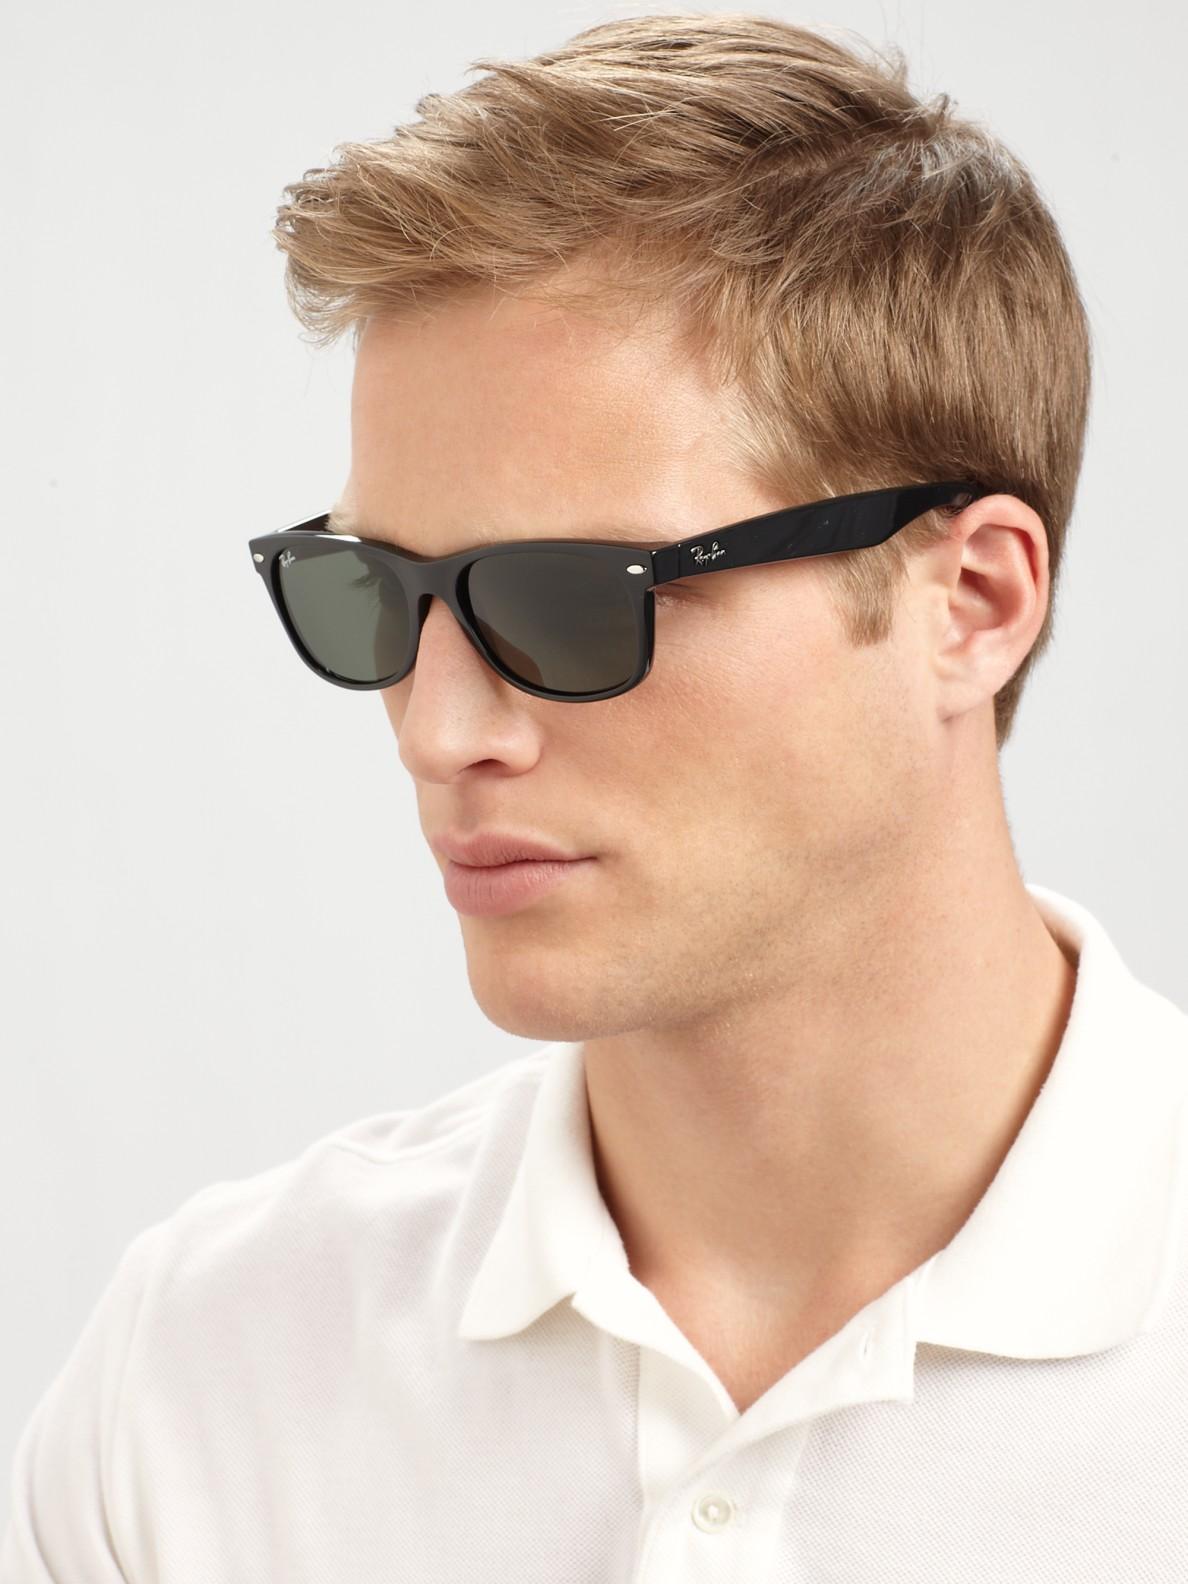 41e7b7dd7f Lyst - Ray-Ban New Wayfarer Sunglasses in Black for Men